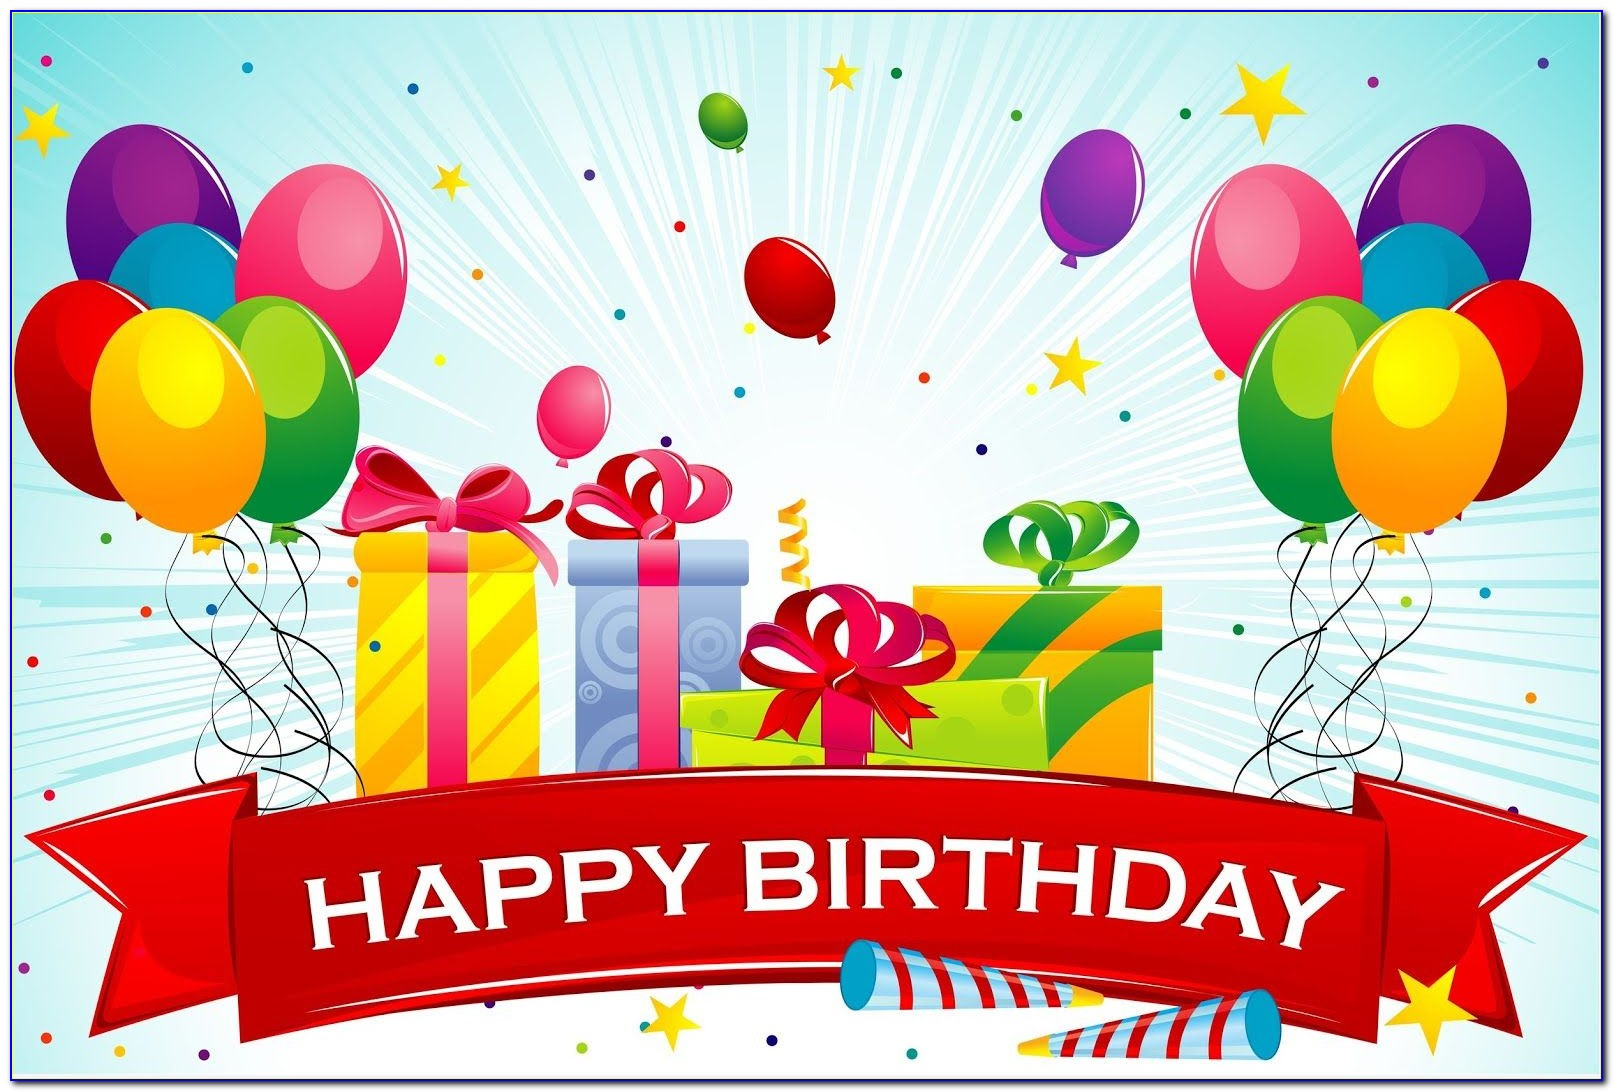 Happy Birthday Cards Online Editing